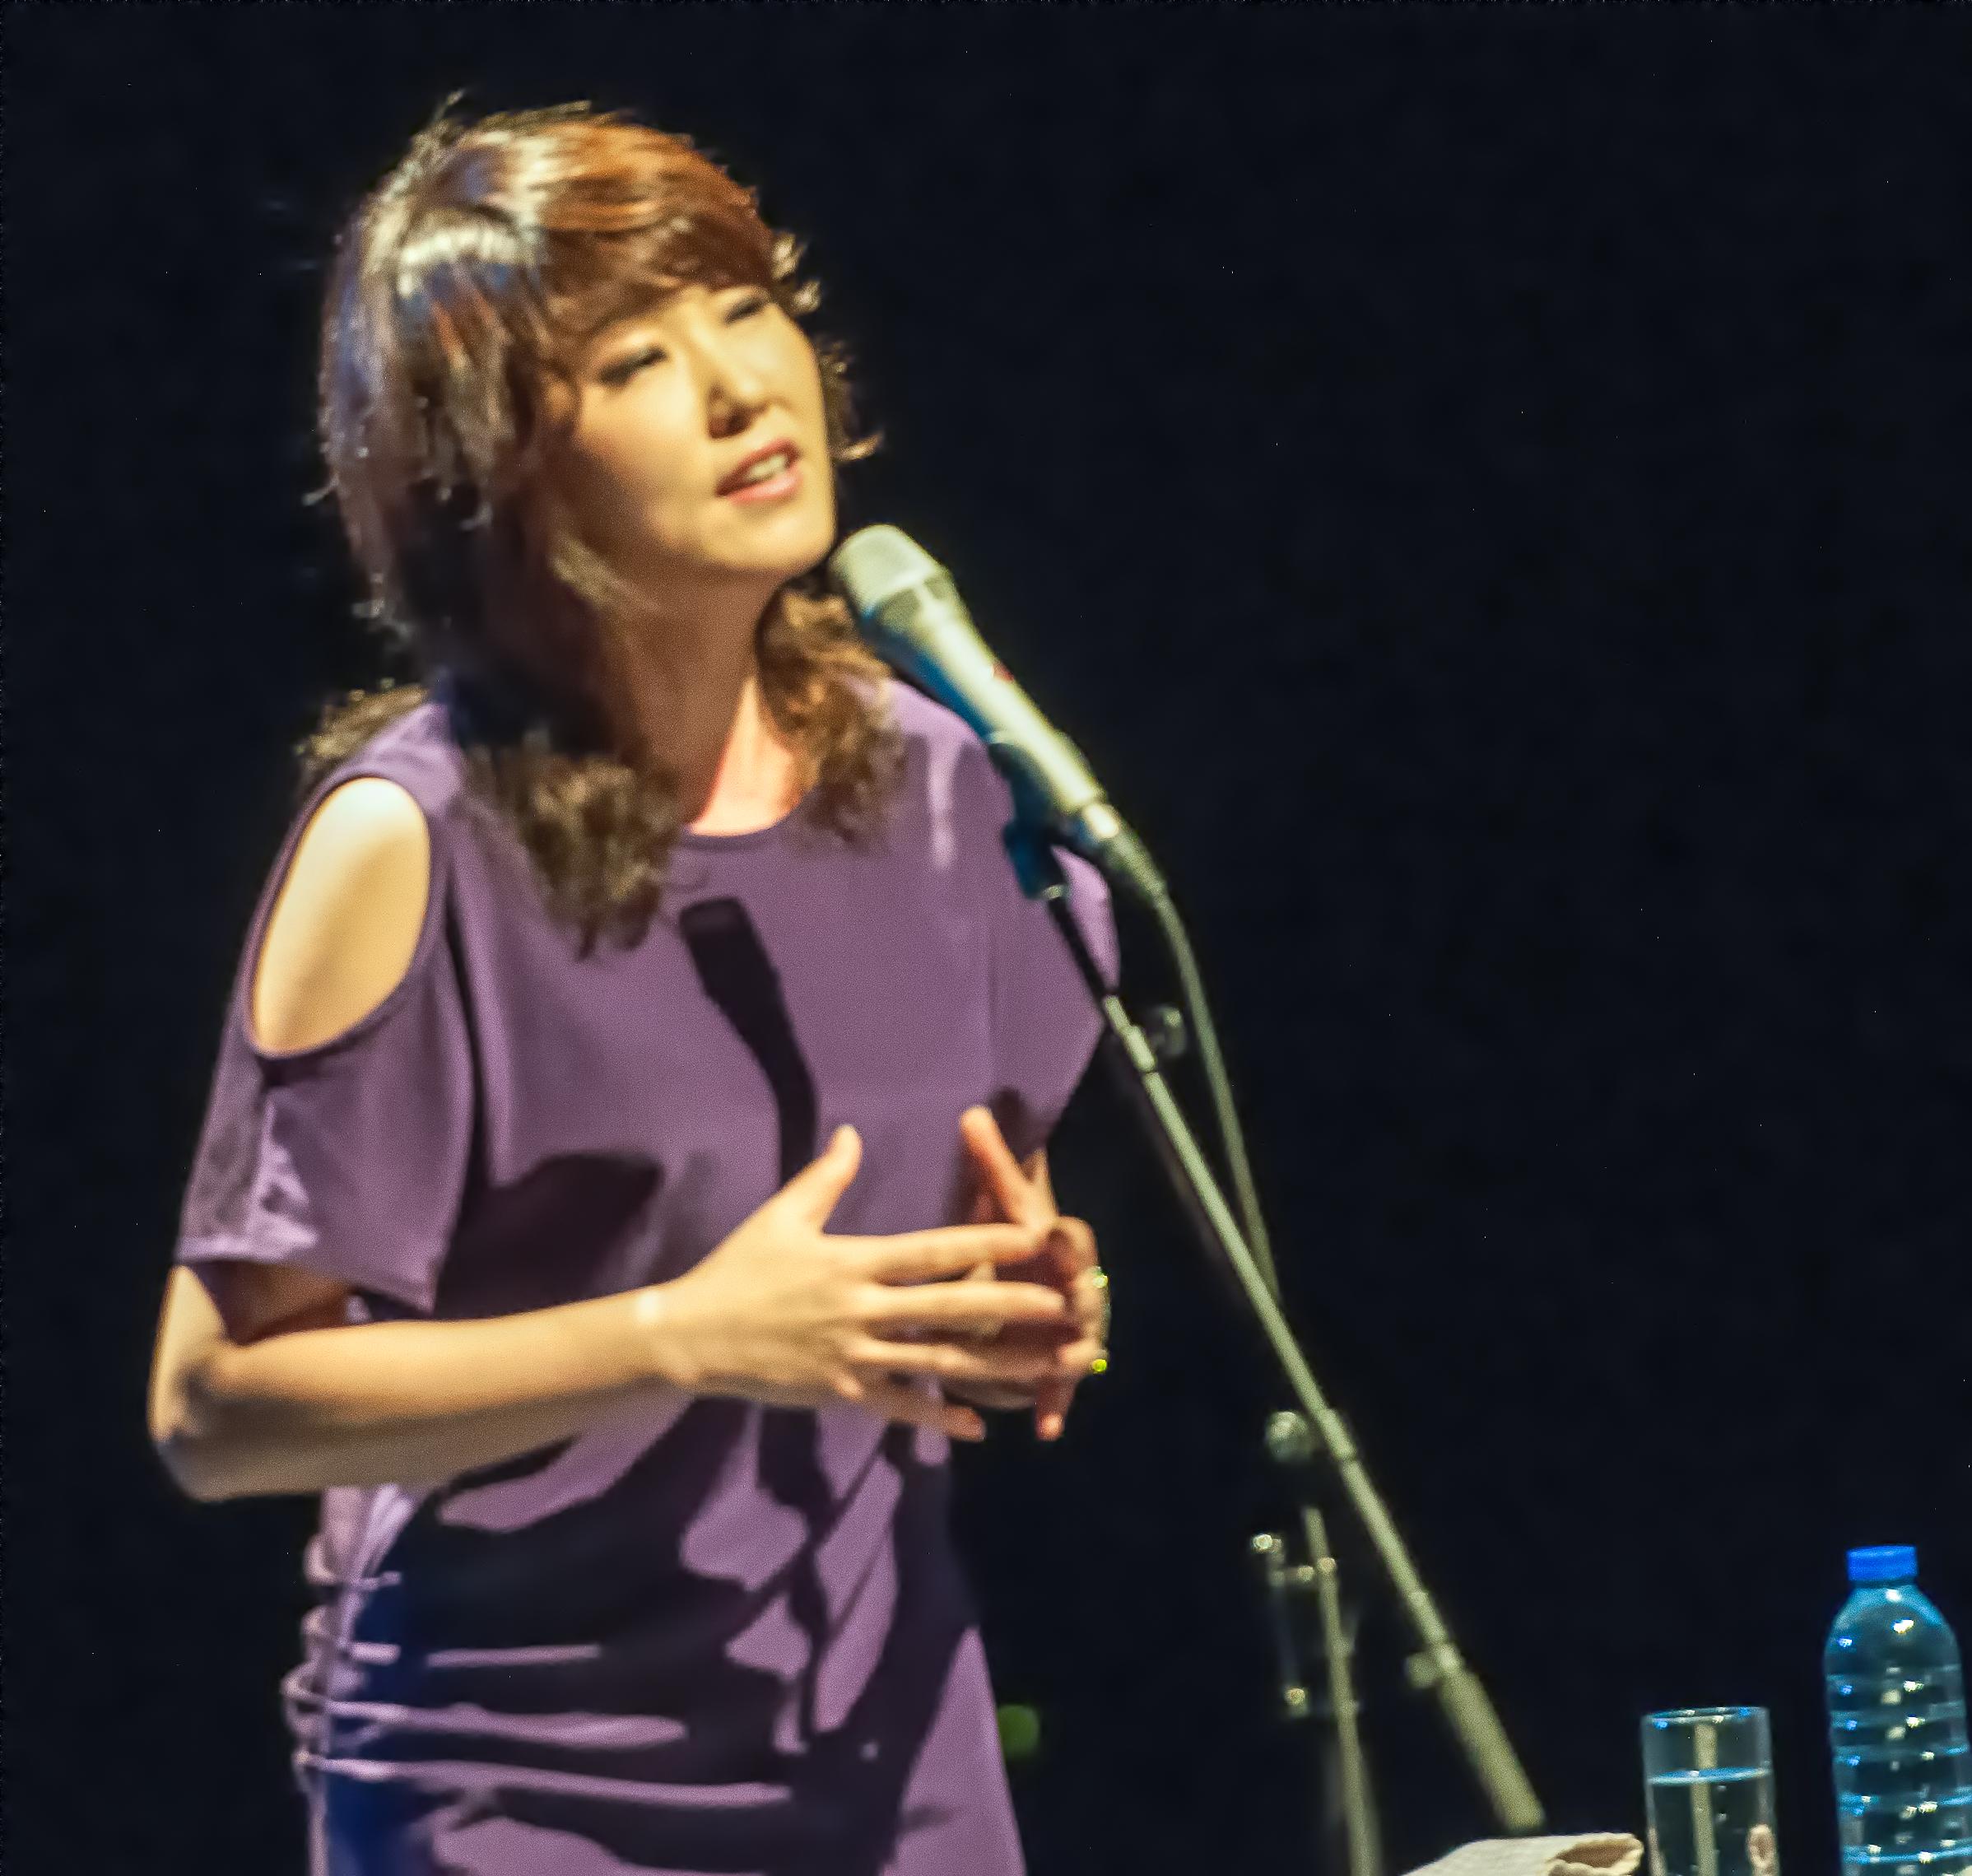 Youn sun nah at the montreal international jazz festival 2013